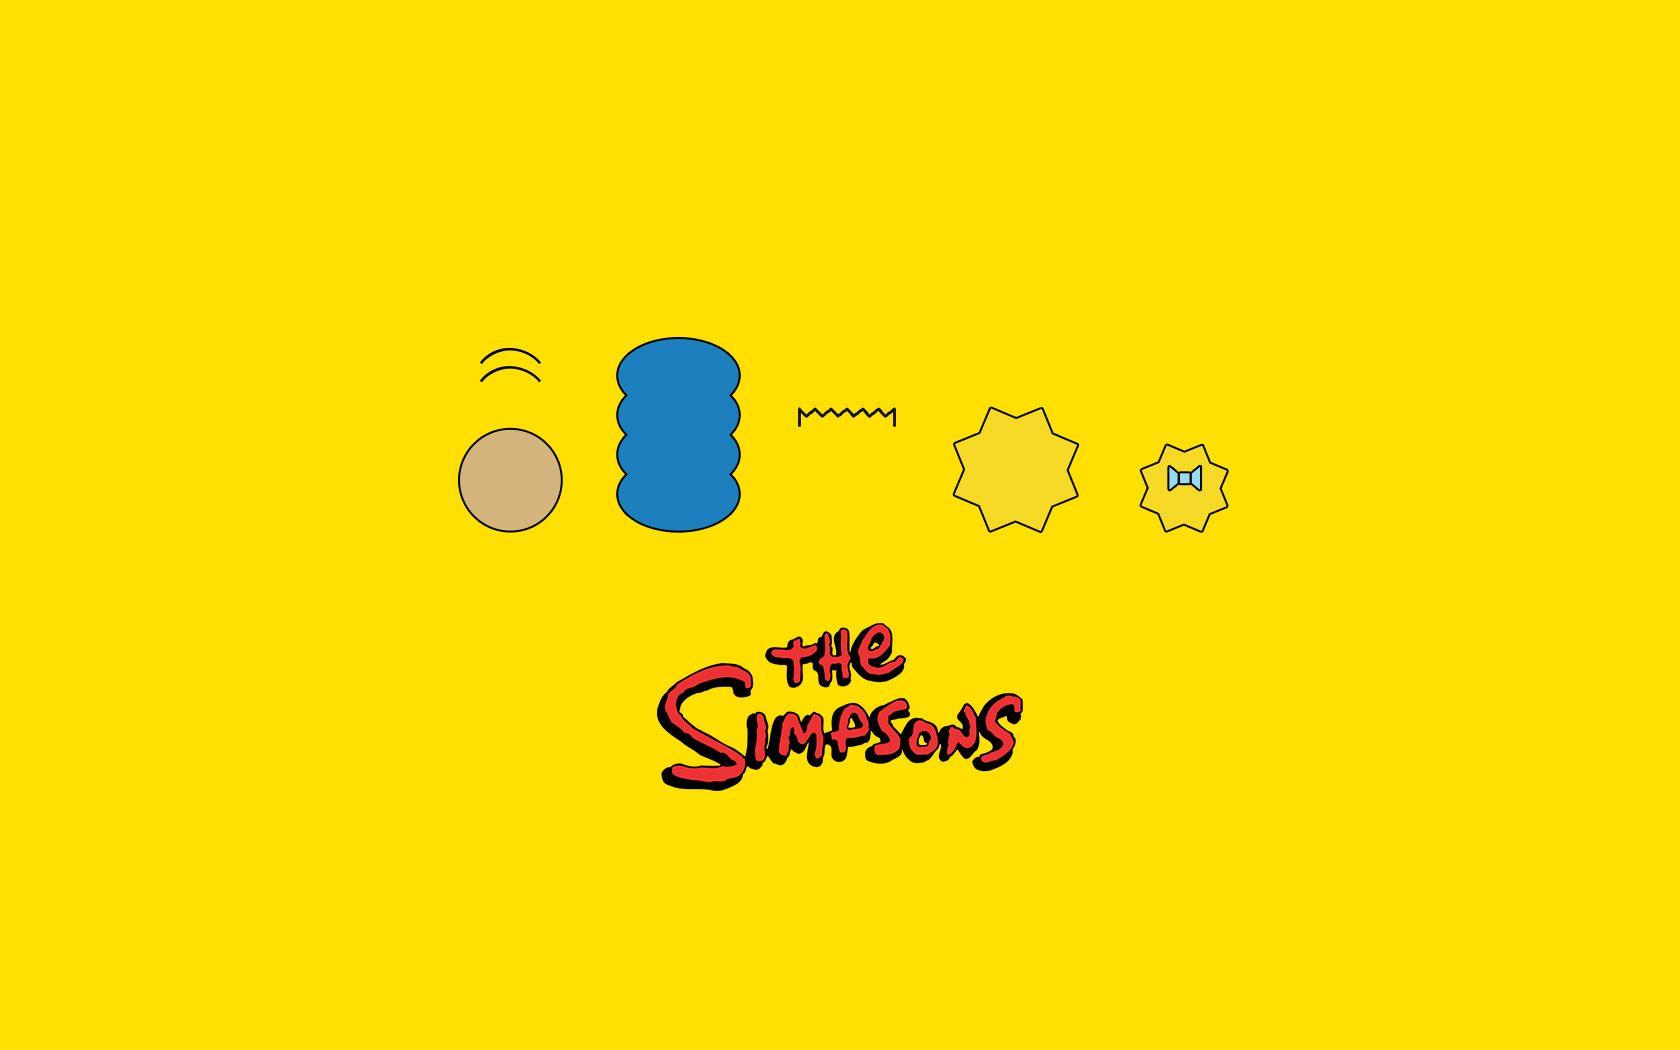 The Simpsons Wallpaper 8 1680 X 1050 Stmednet In 2019